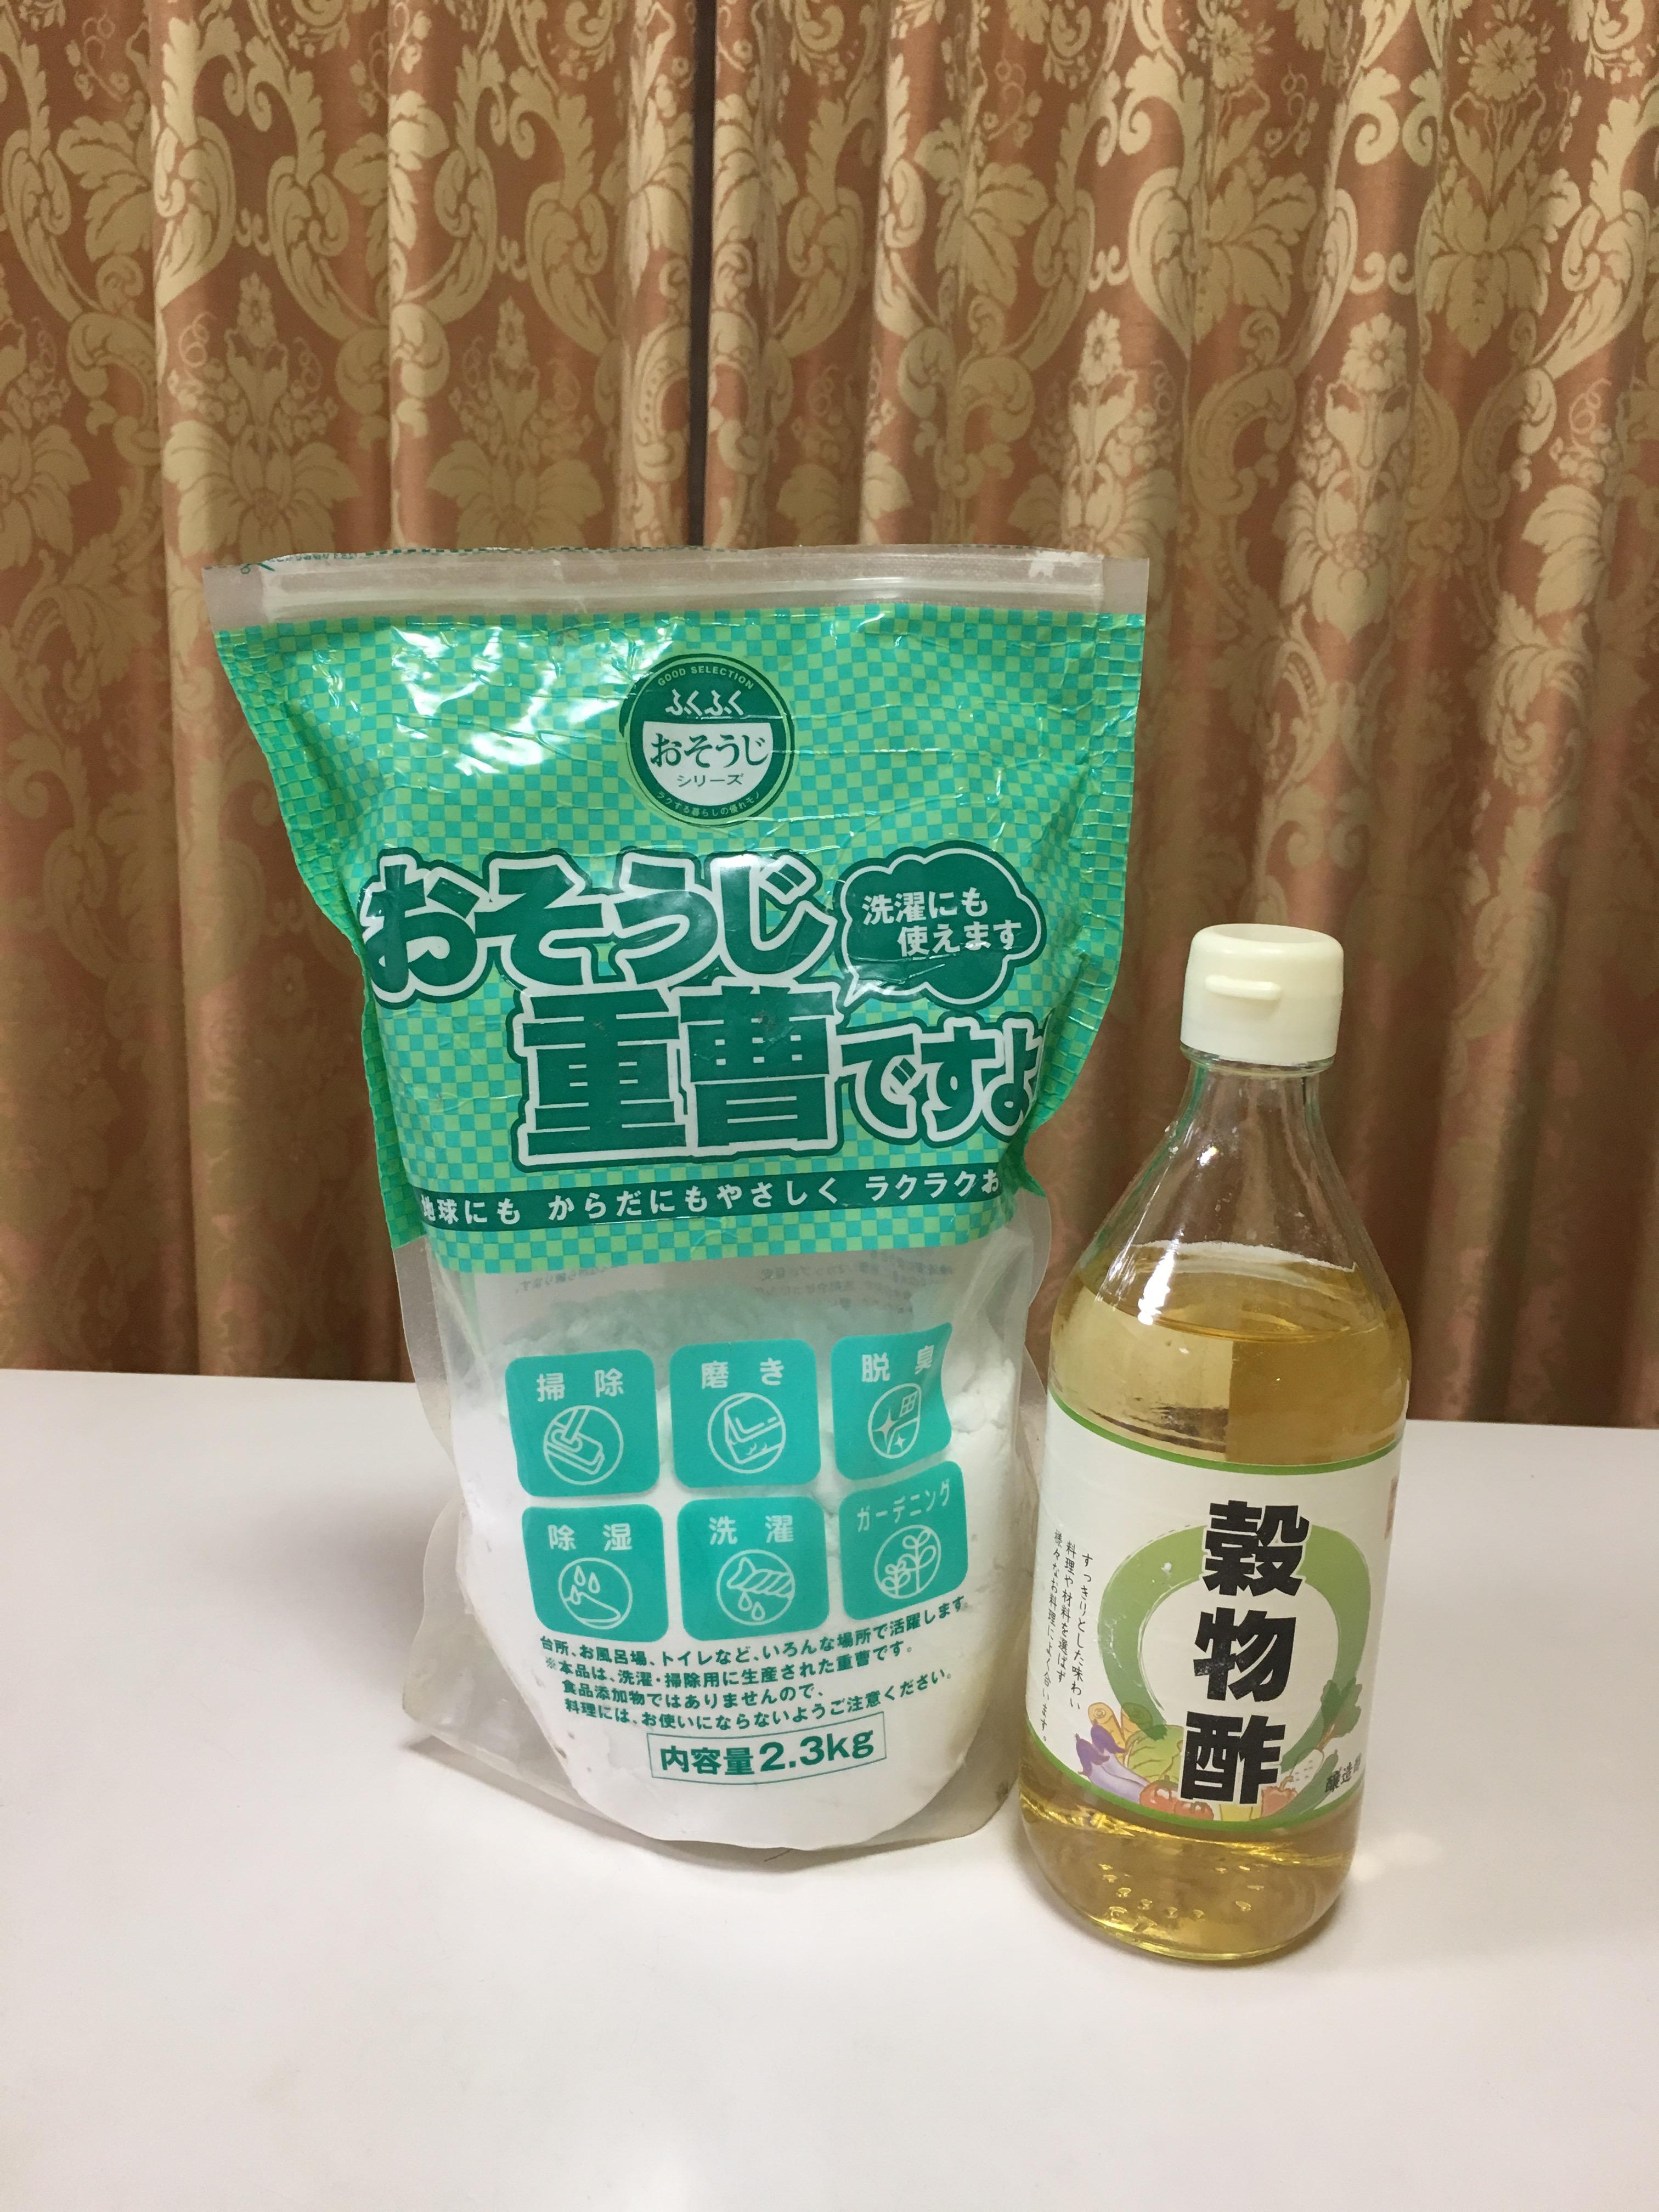 Natural Cleaner: Baking Soda and Vinegar  sonokotchi